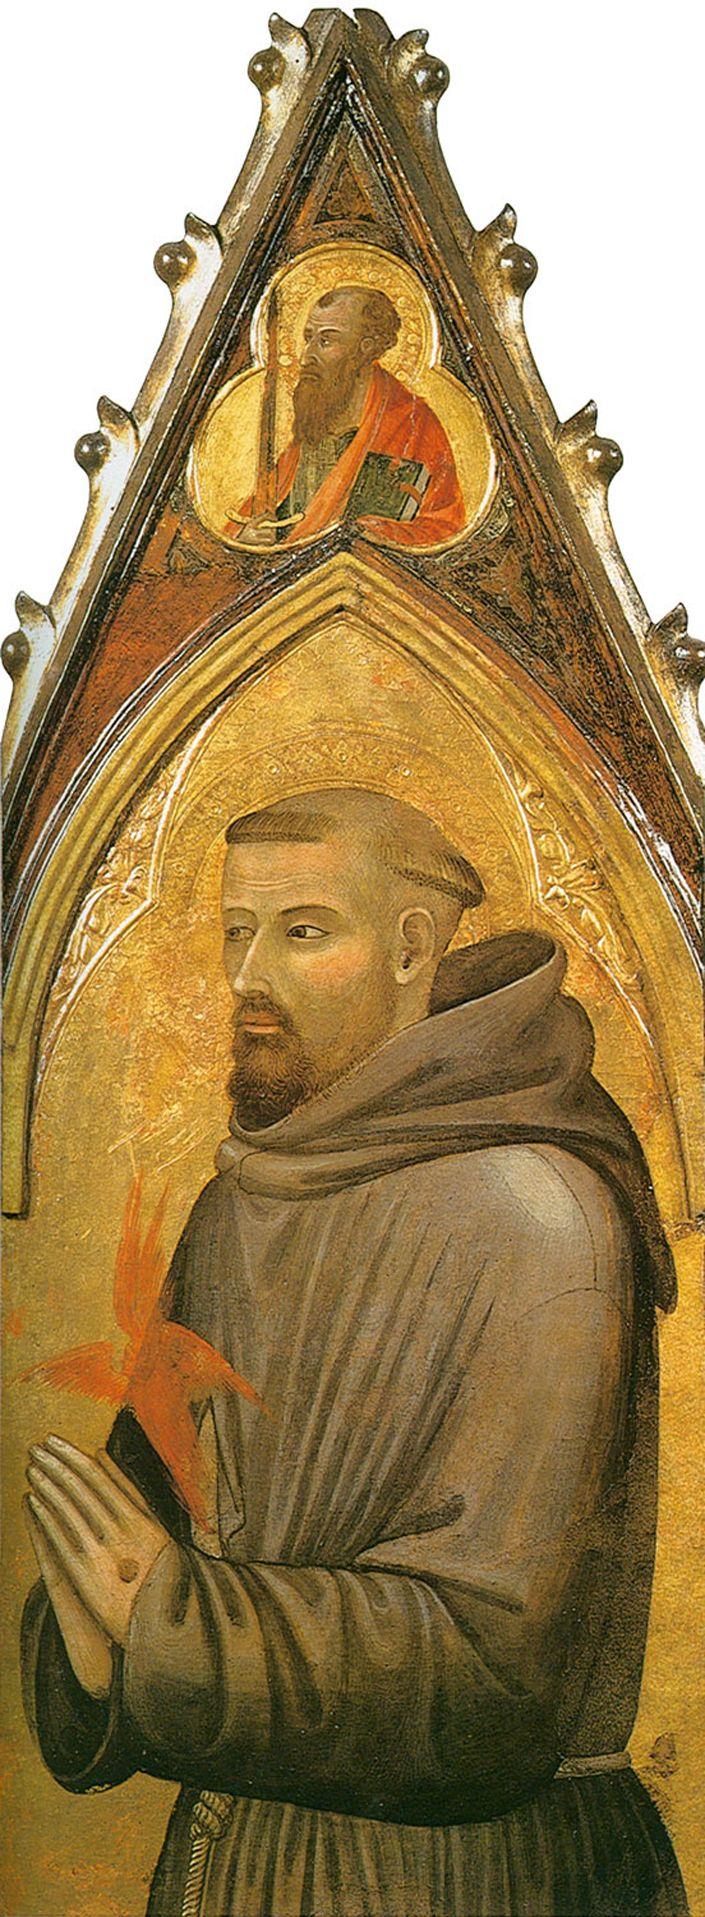 Ambrogio Lorenzetti (Siena, about 1290 - Siena, 1348)  Saint Francis  Gold and tempera on panel, 1330-1340  Museo dell�Opera del Duomo, Siena, Italy